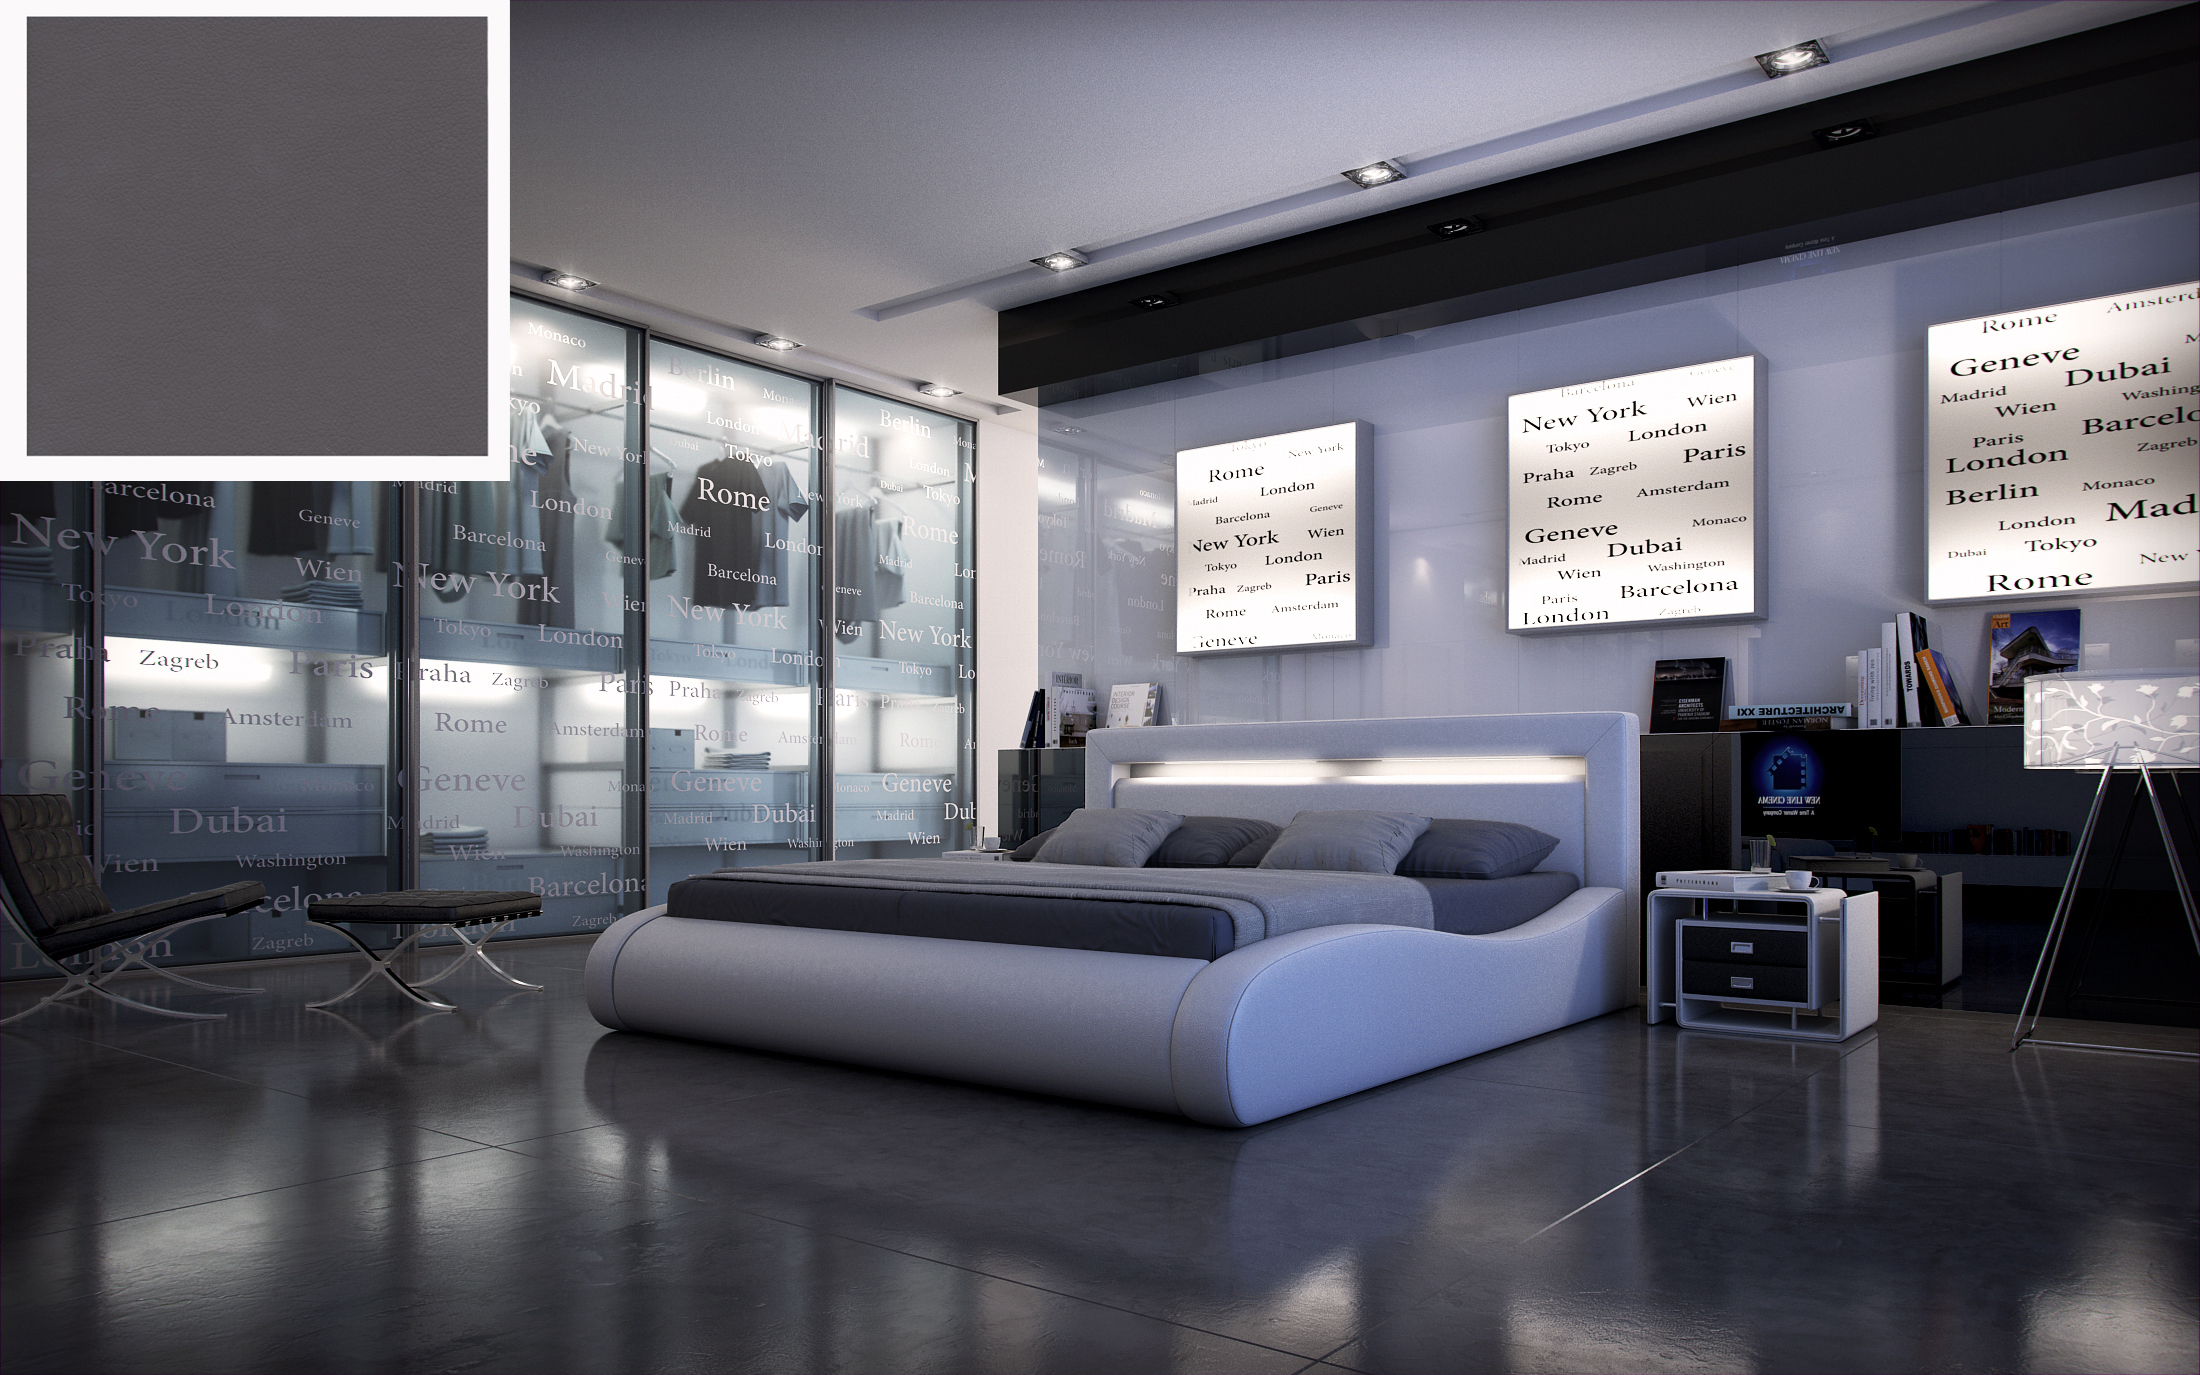 Full Size of Polsterbett Doppelbett 200 220 Cm Led Grau Sprint Ii Betten 200x220 Bett Wohnzimmer Polsterbett 200x220